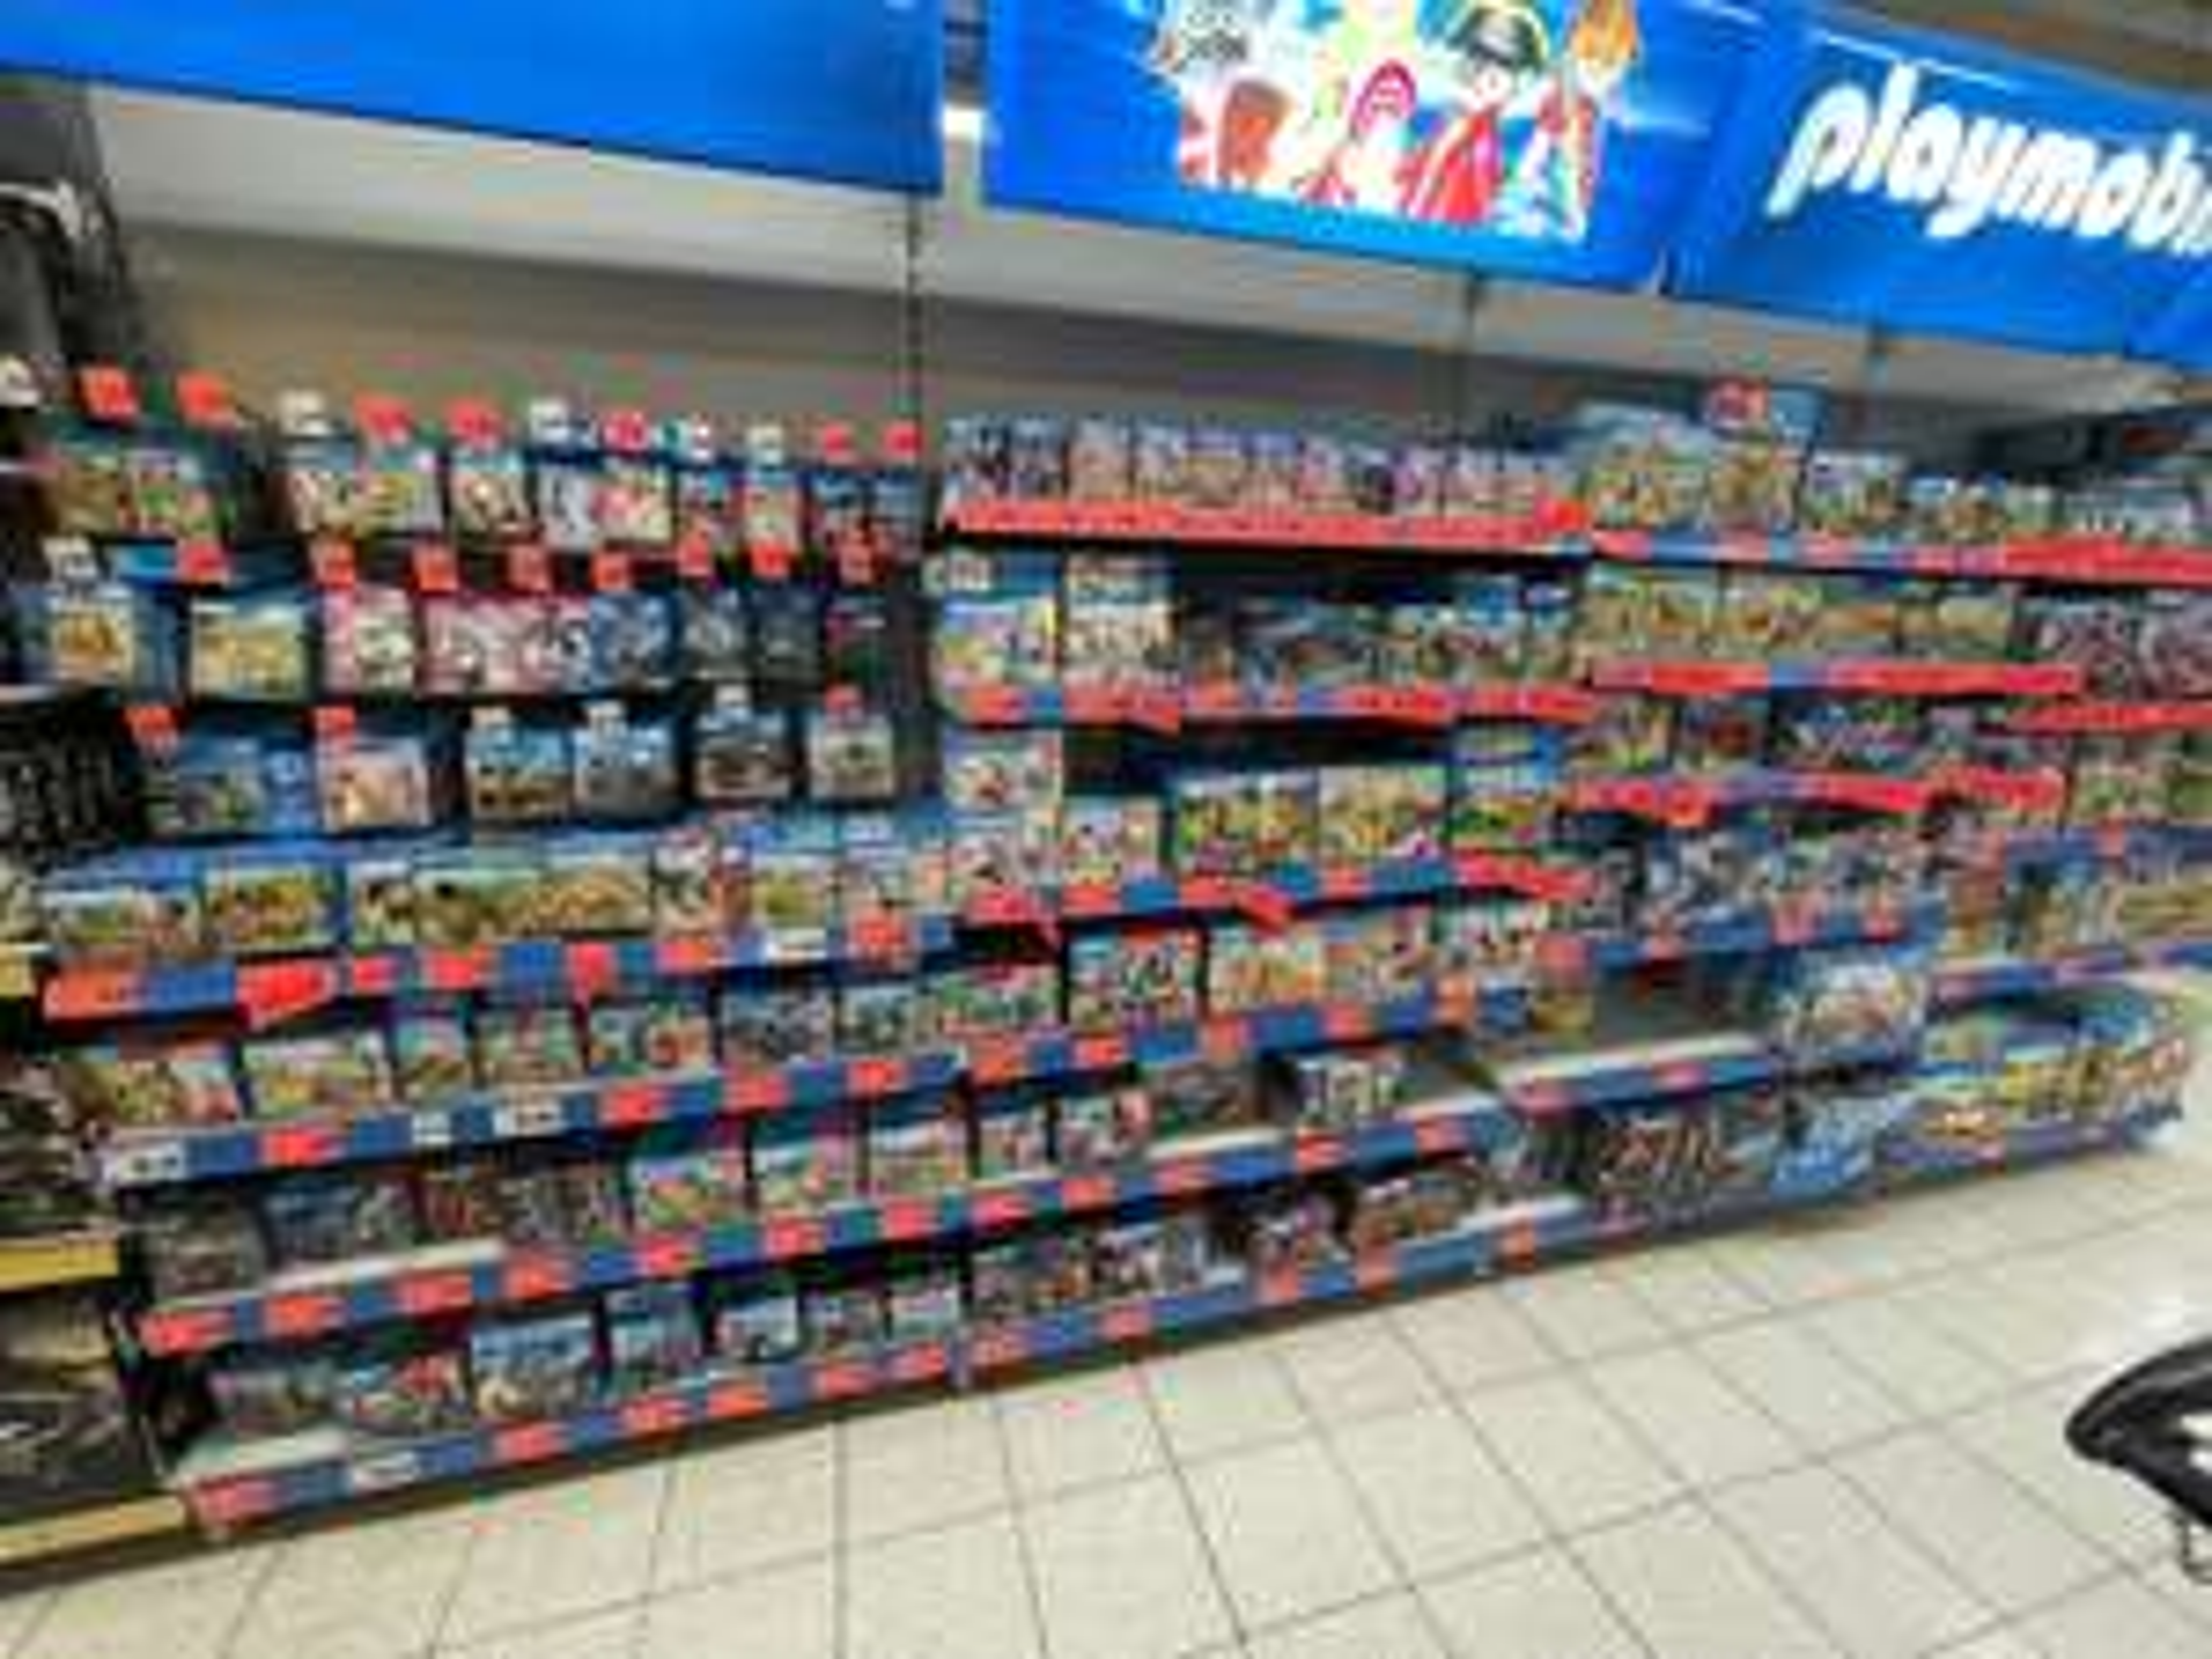 Kaufland Havelpark Dallgow: 50% auf Playmobil